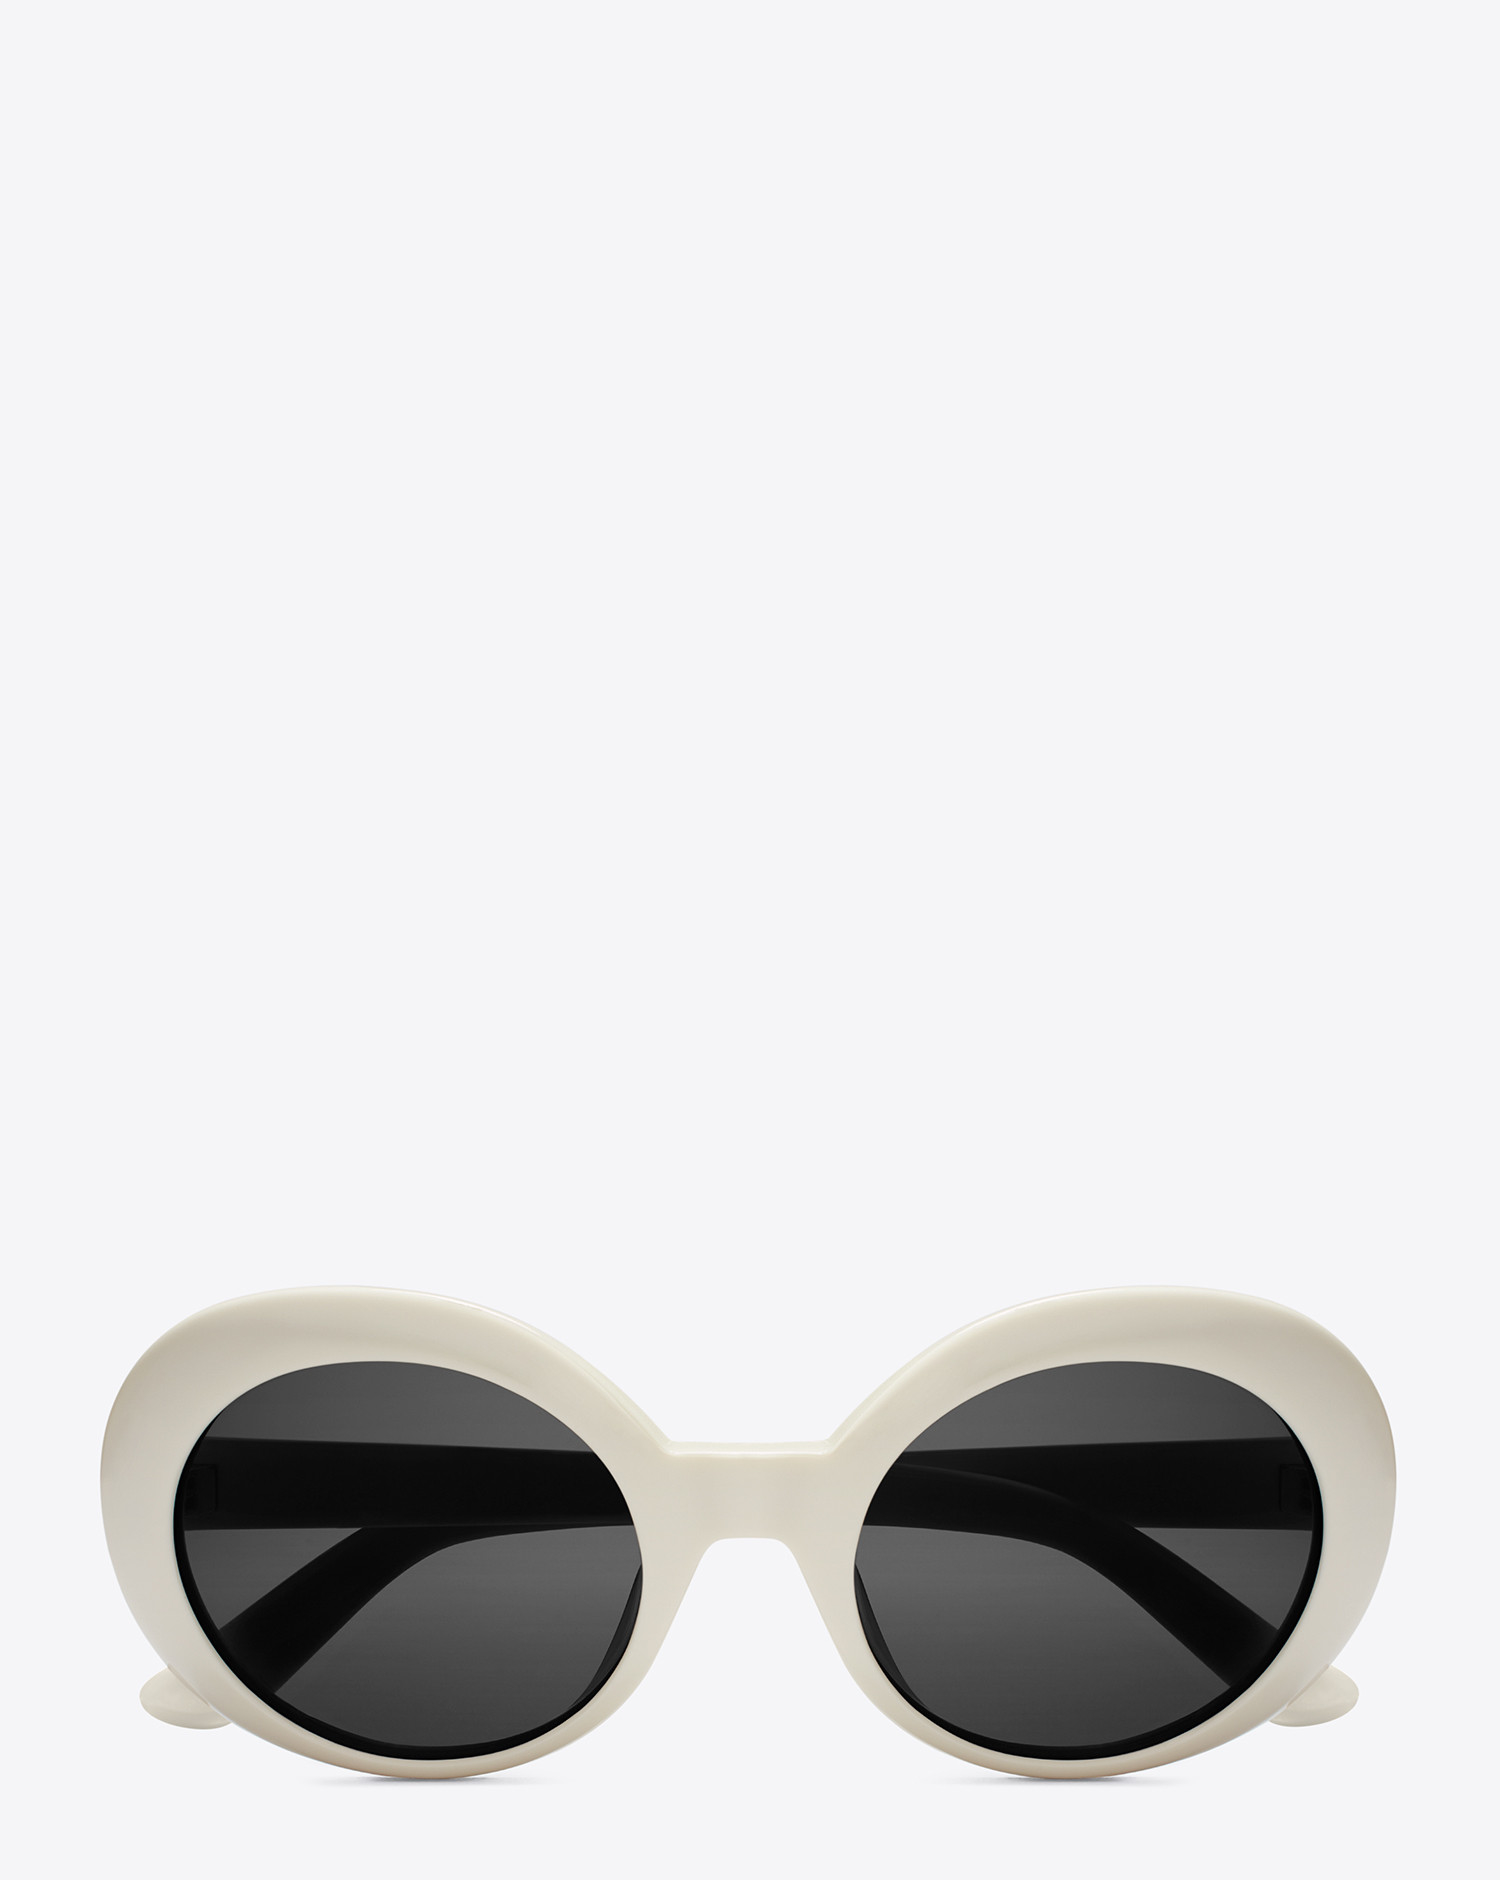 75901f324373 Saint Laurent New Wave 98 California Sunglasses In Shiny Ivory ...